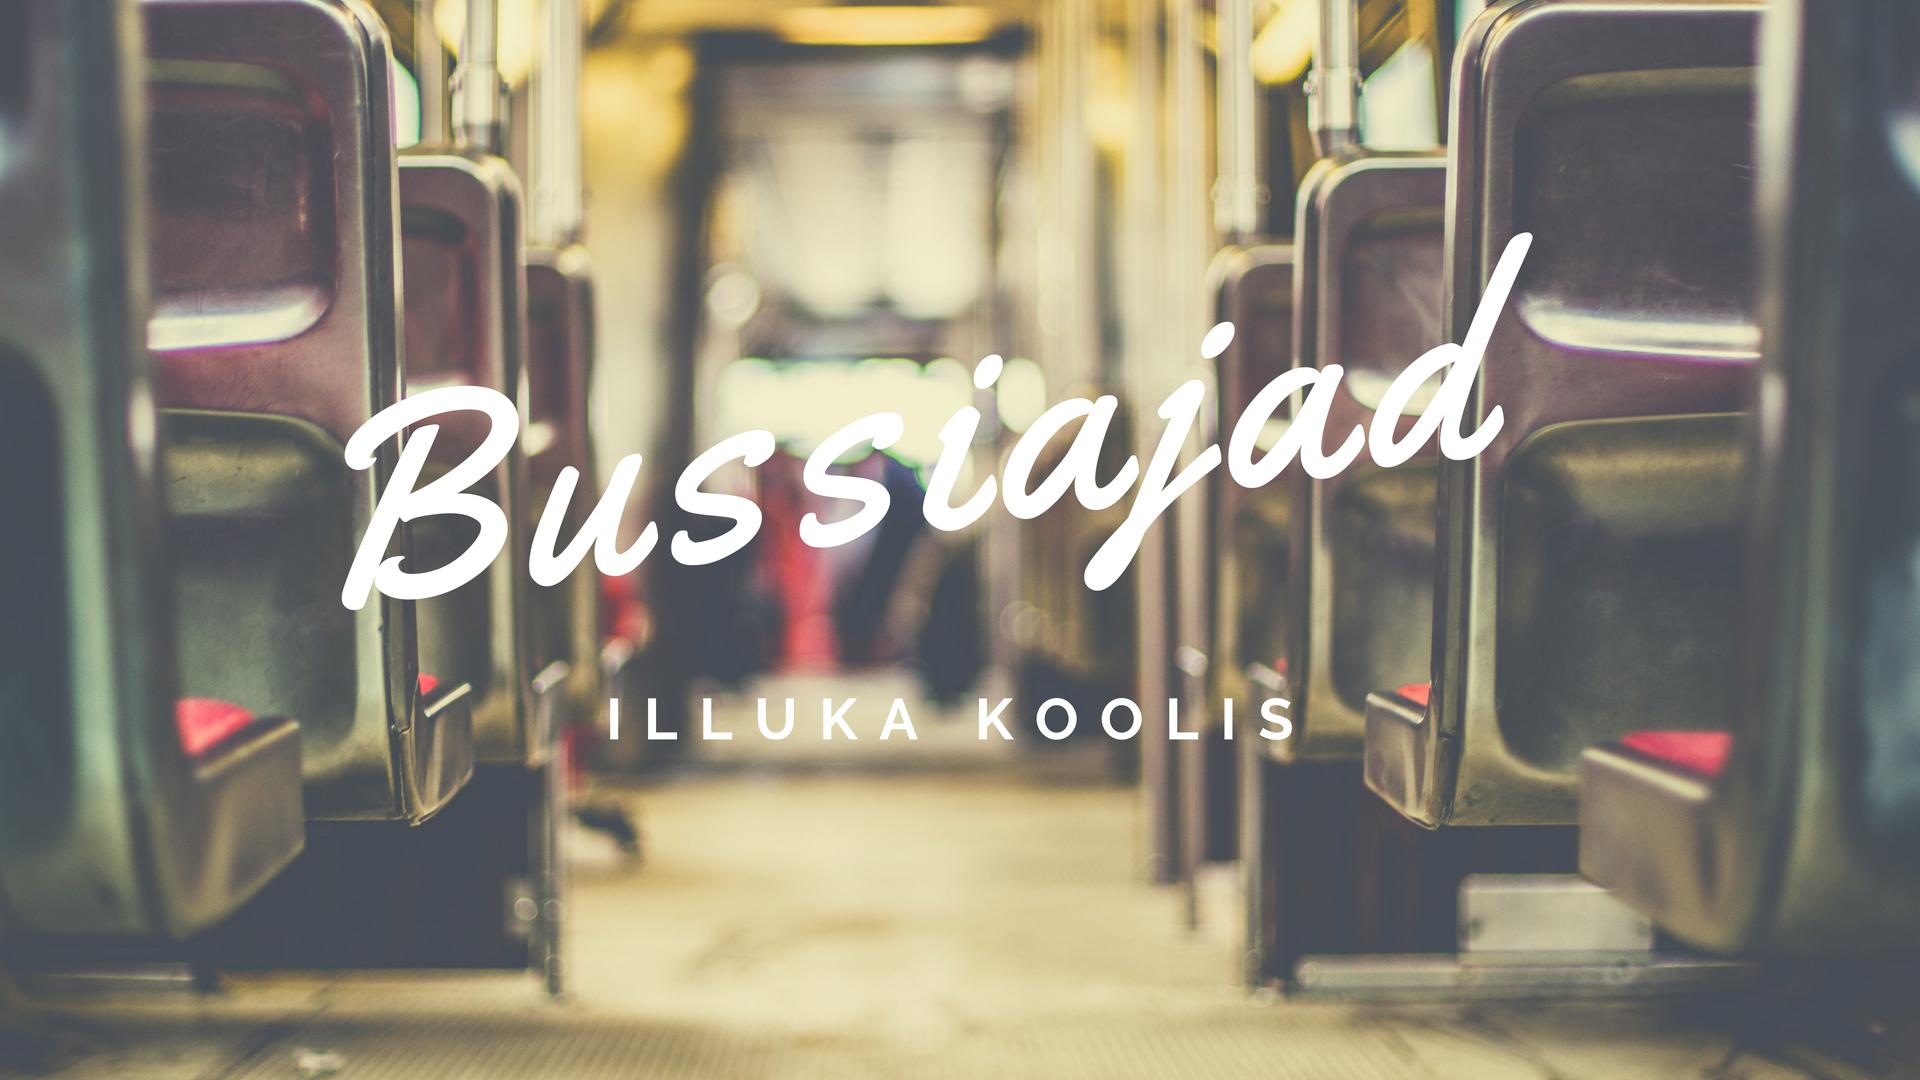 Bussiajad